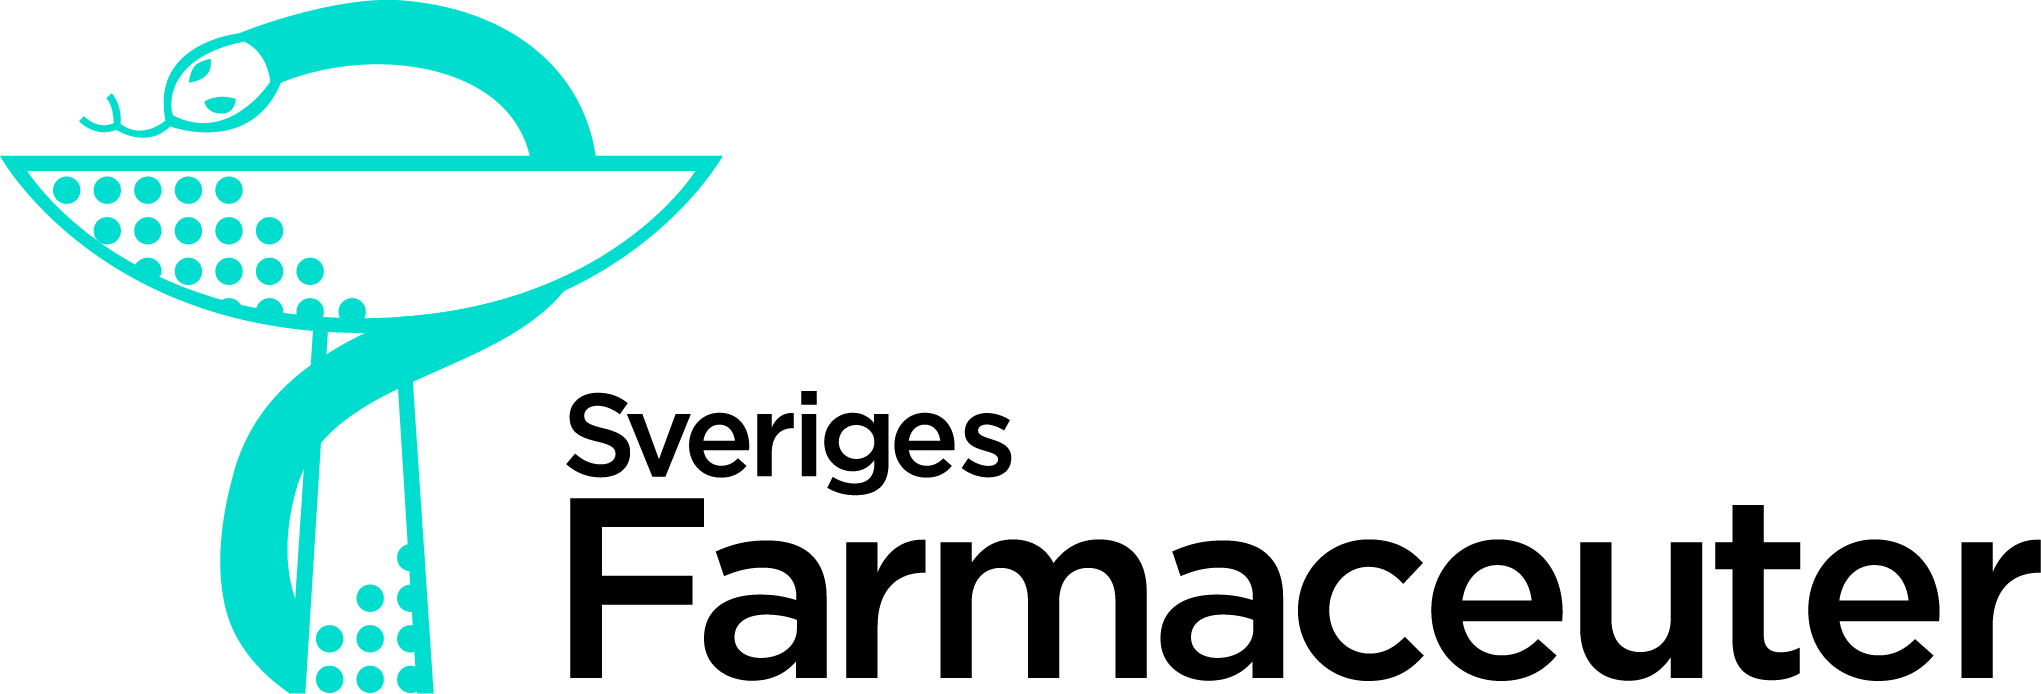 Sveriges farmaceuter